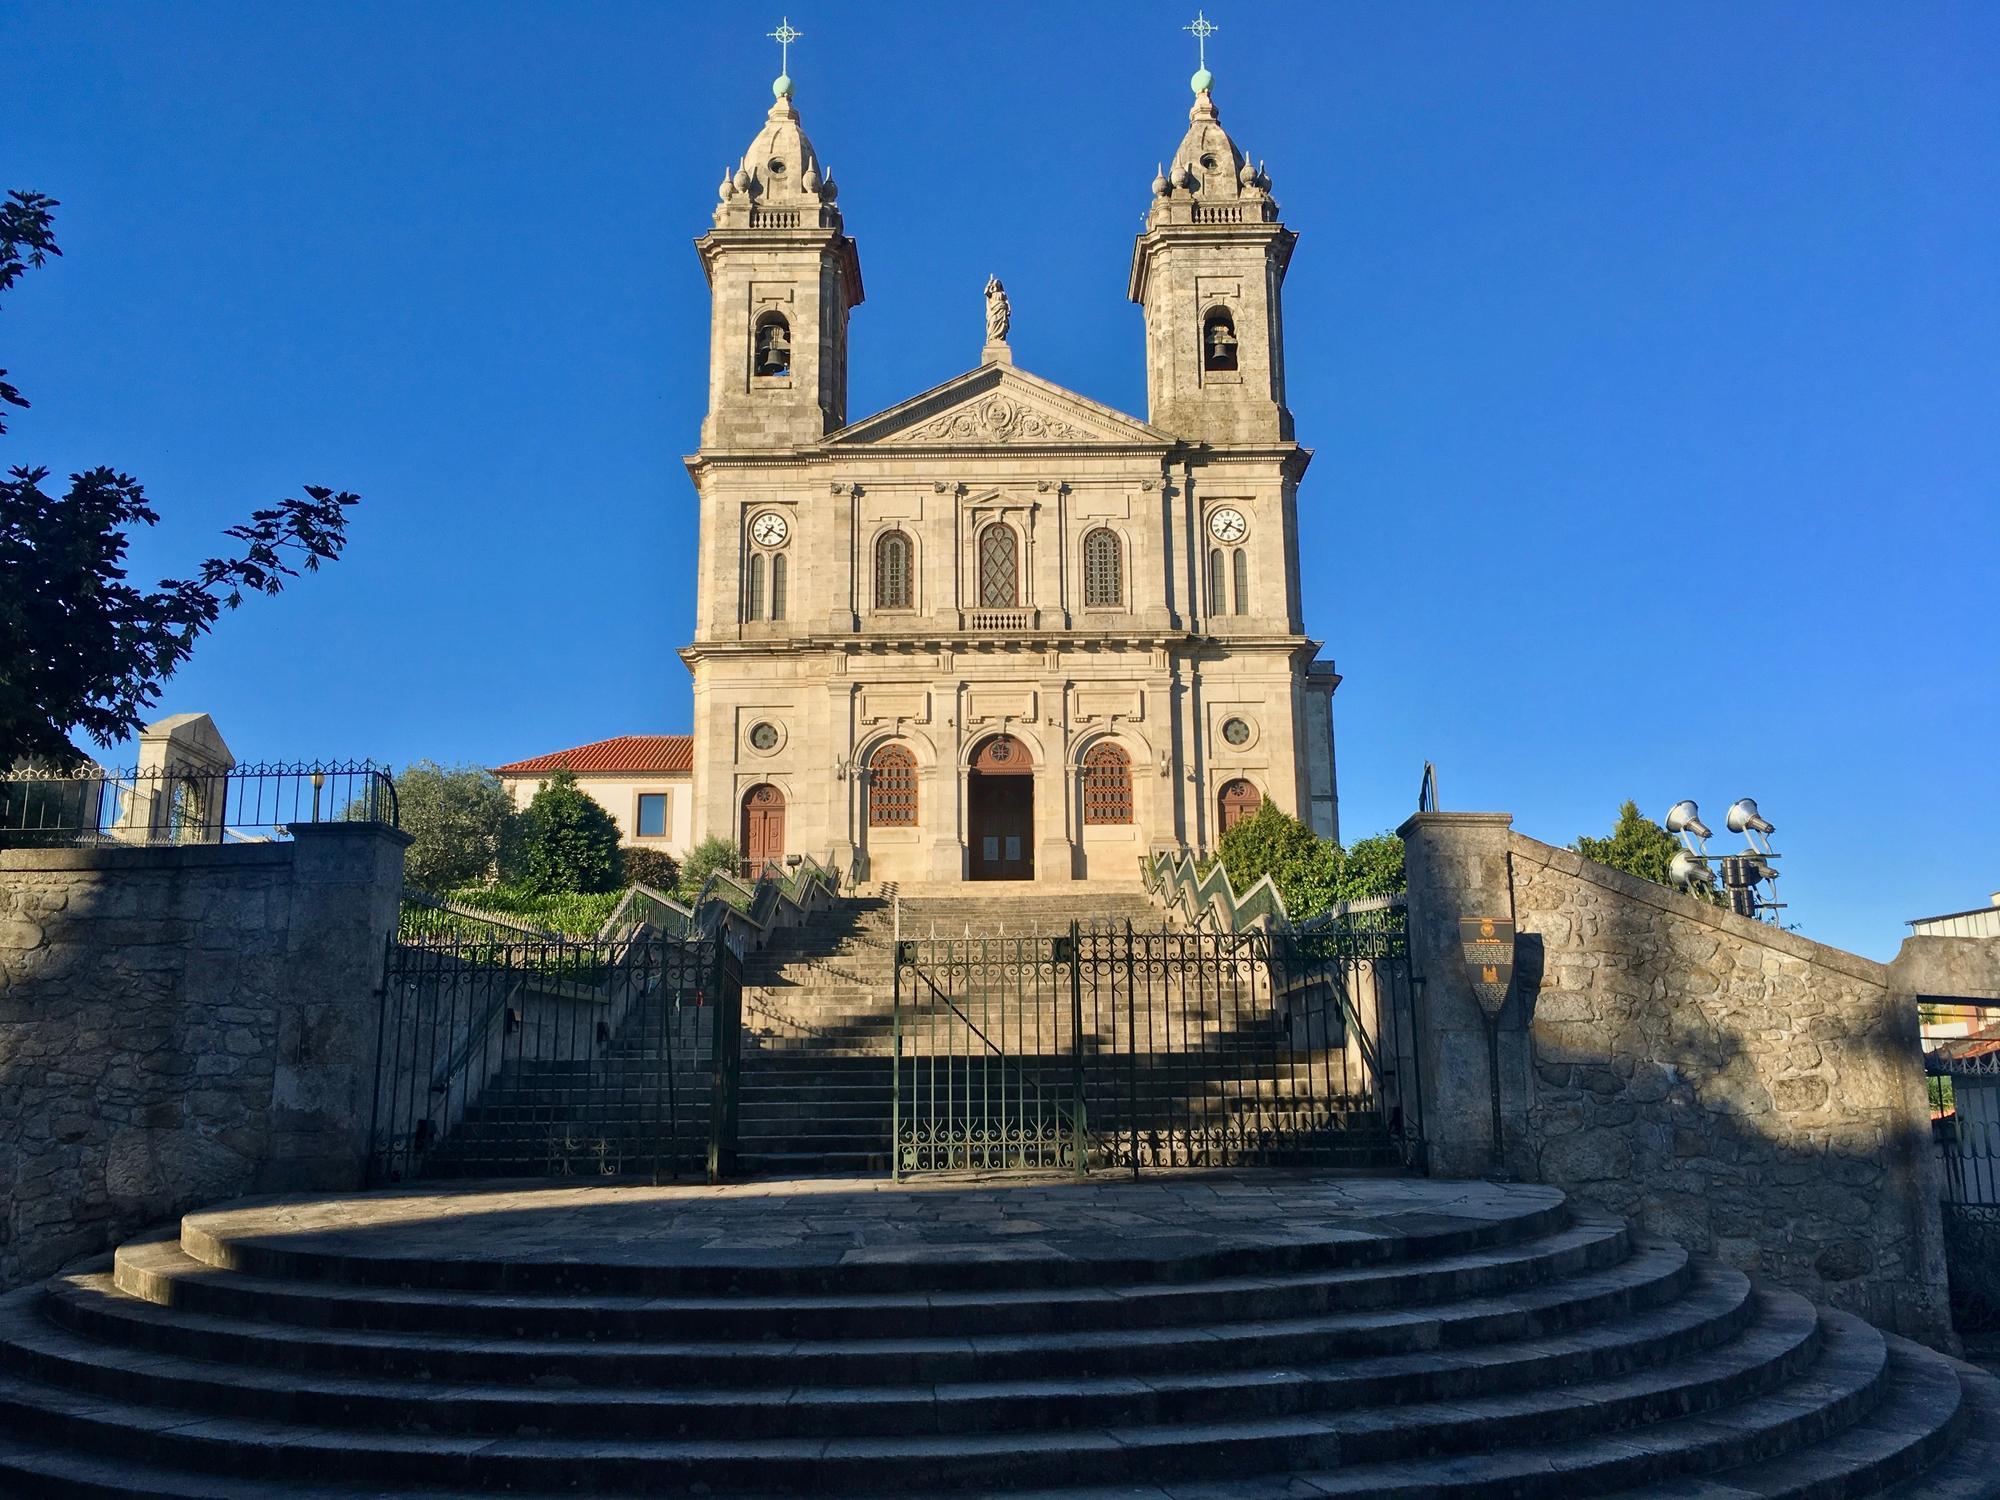 🇵🇹 Порту, Португалия, май 2019.